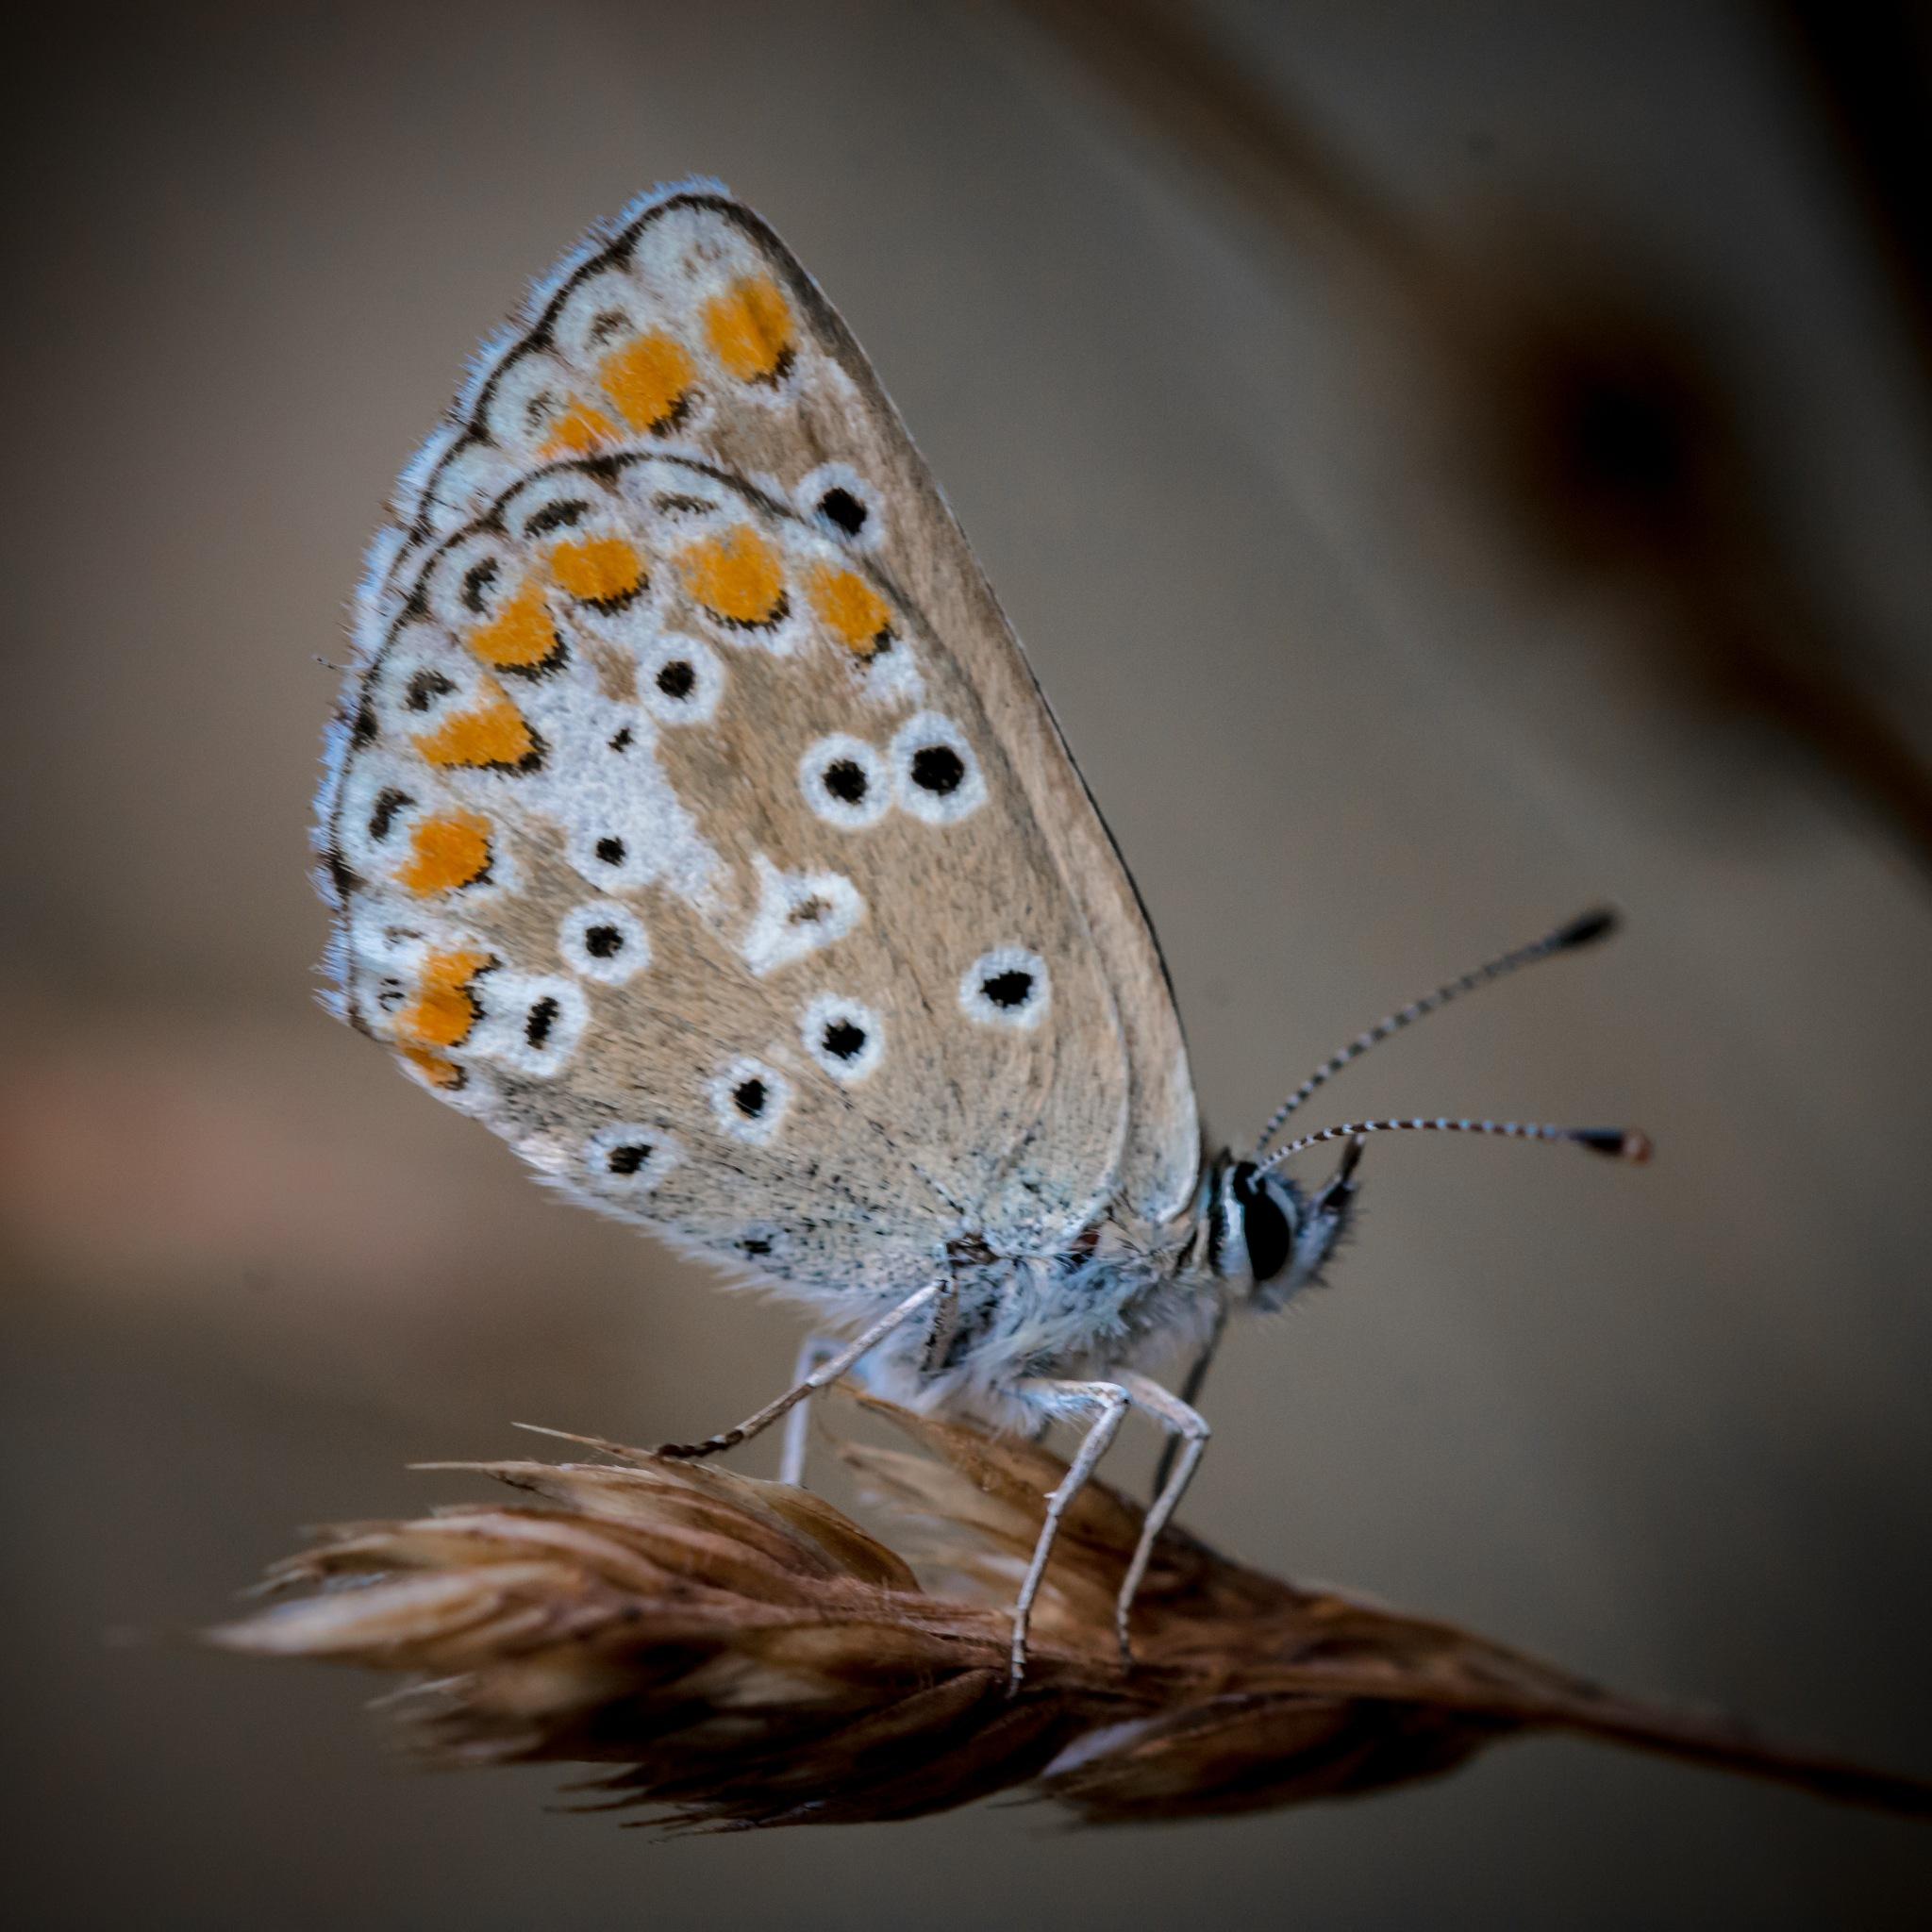 Butterfly by ThomasBeuker